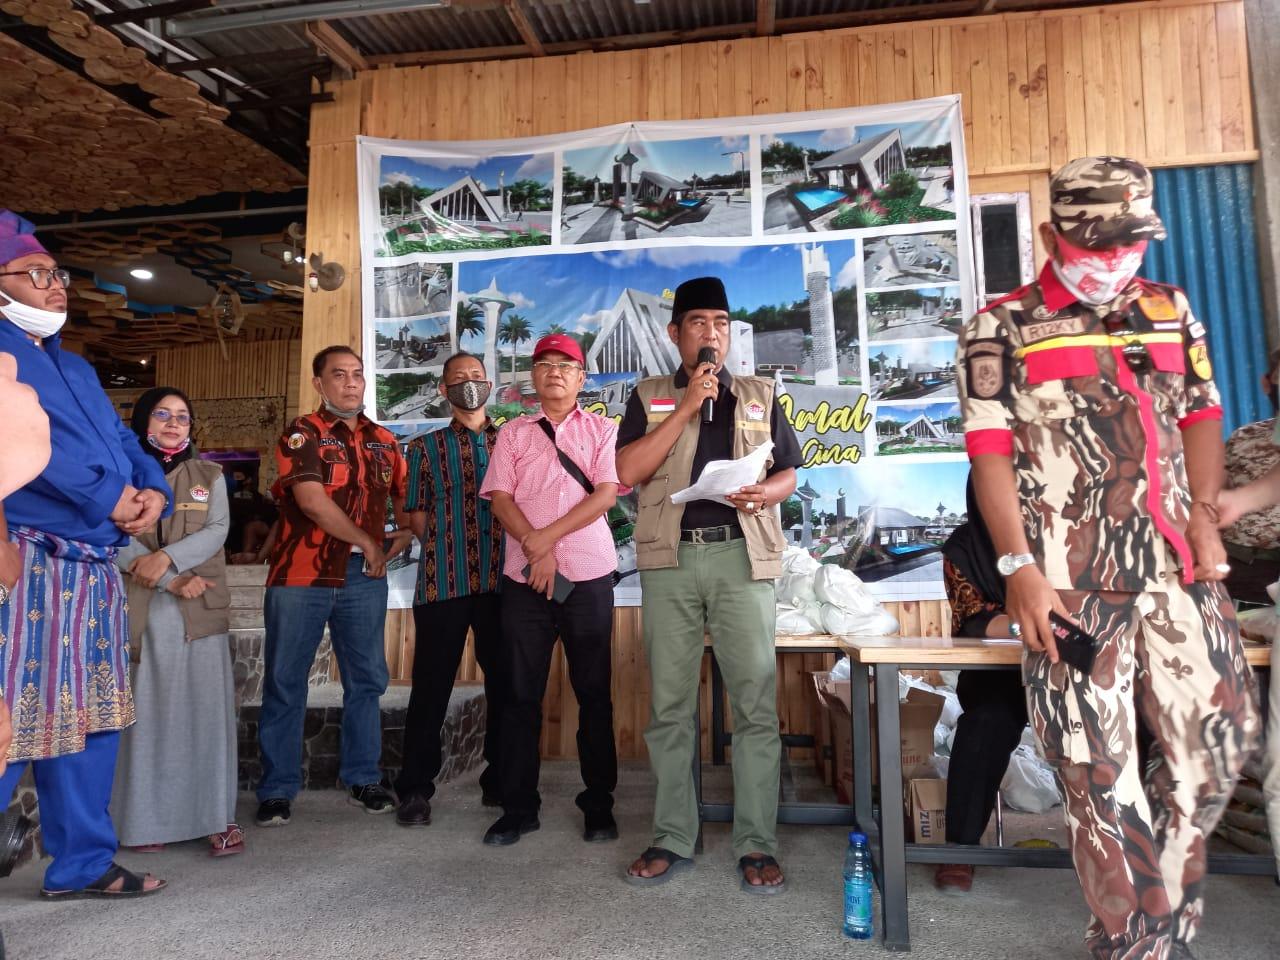 Santri Tani Indonesia Laksanakan Upacara Kenegaraan HUT RI ke 75,di RA Cafe Aren